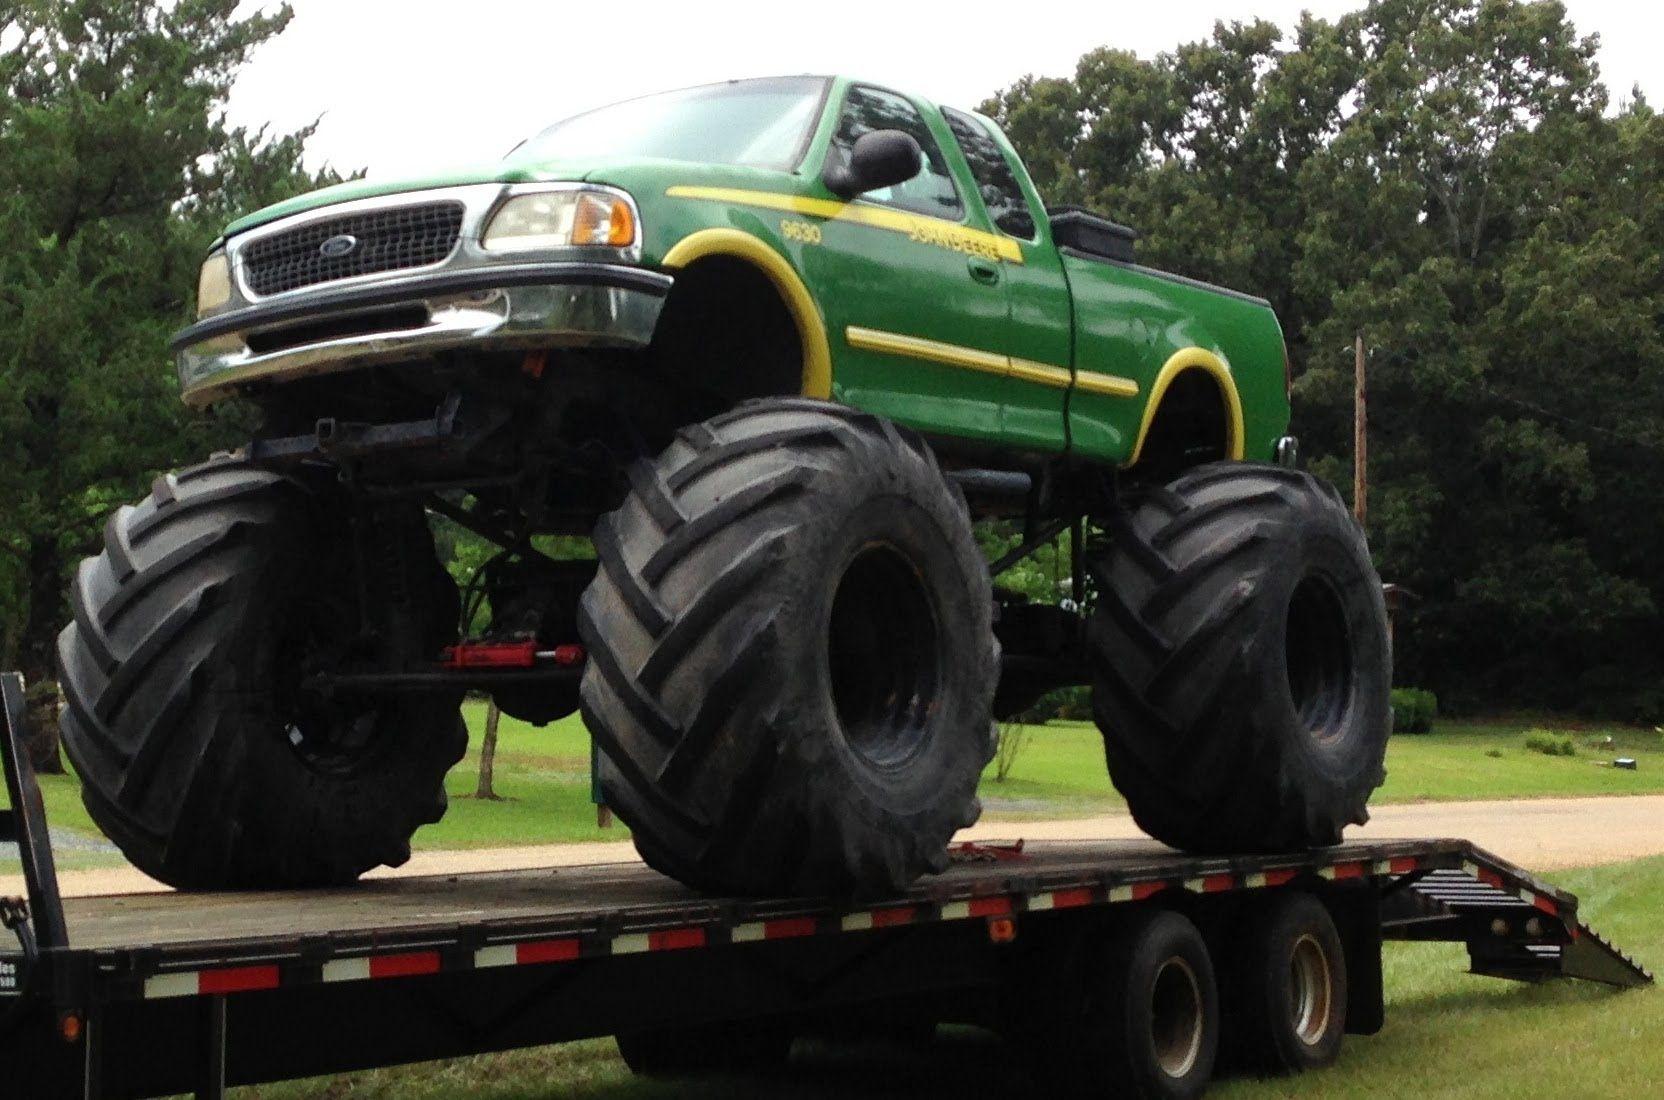 Monster mud trucks john deere monster truck bog truck mud bigfoot tractor tires huge